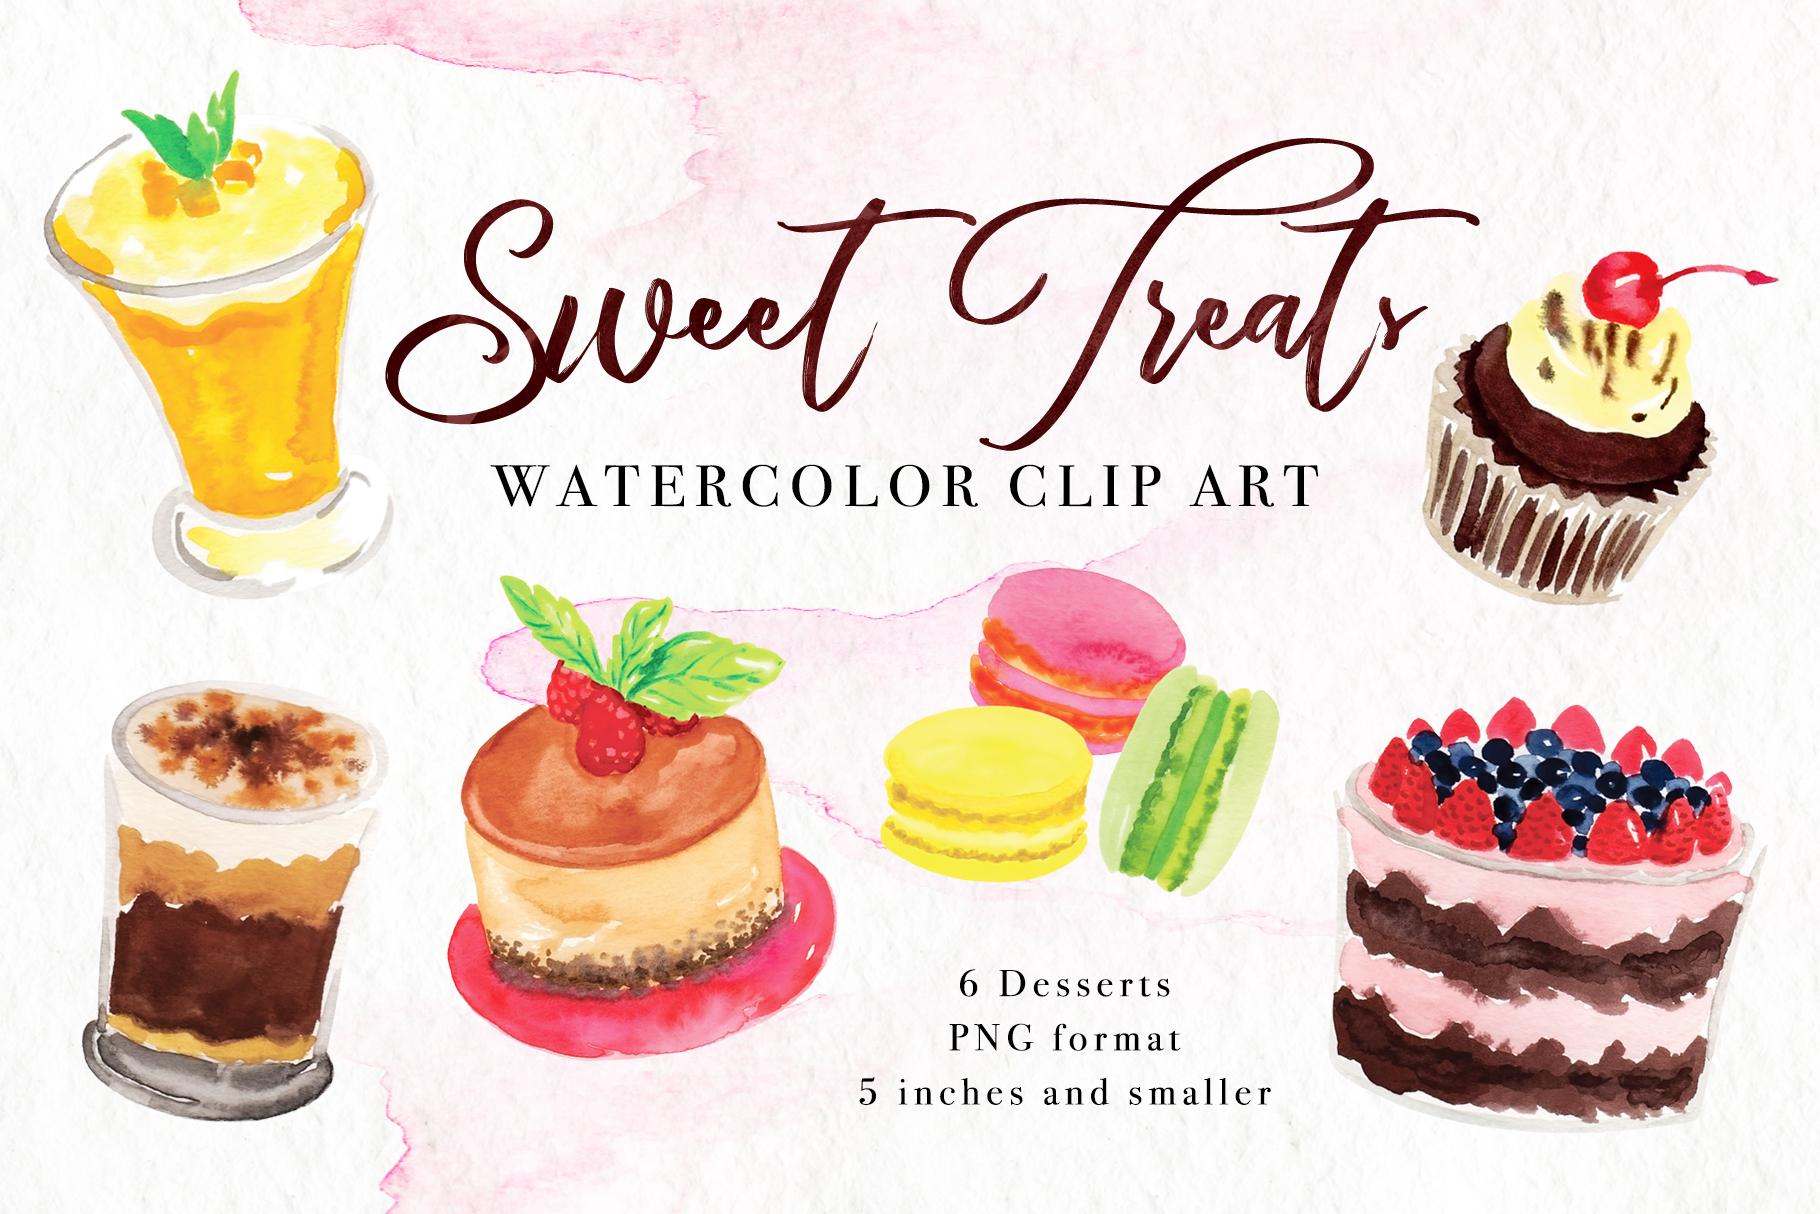 Sweet Treats Watercolor Clip Art example image 1